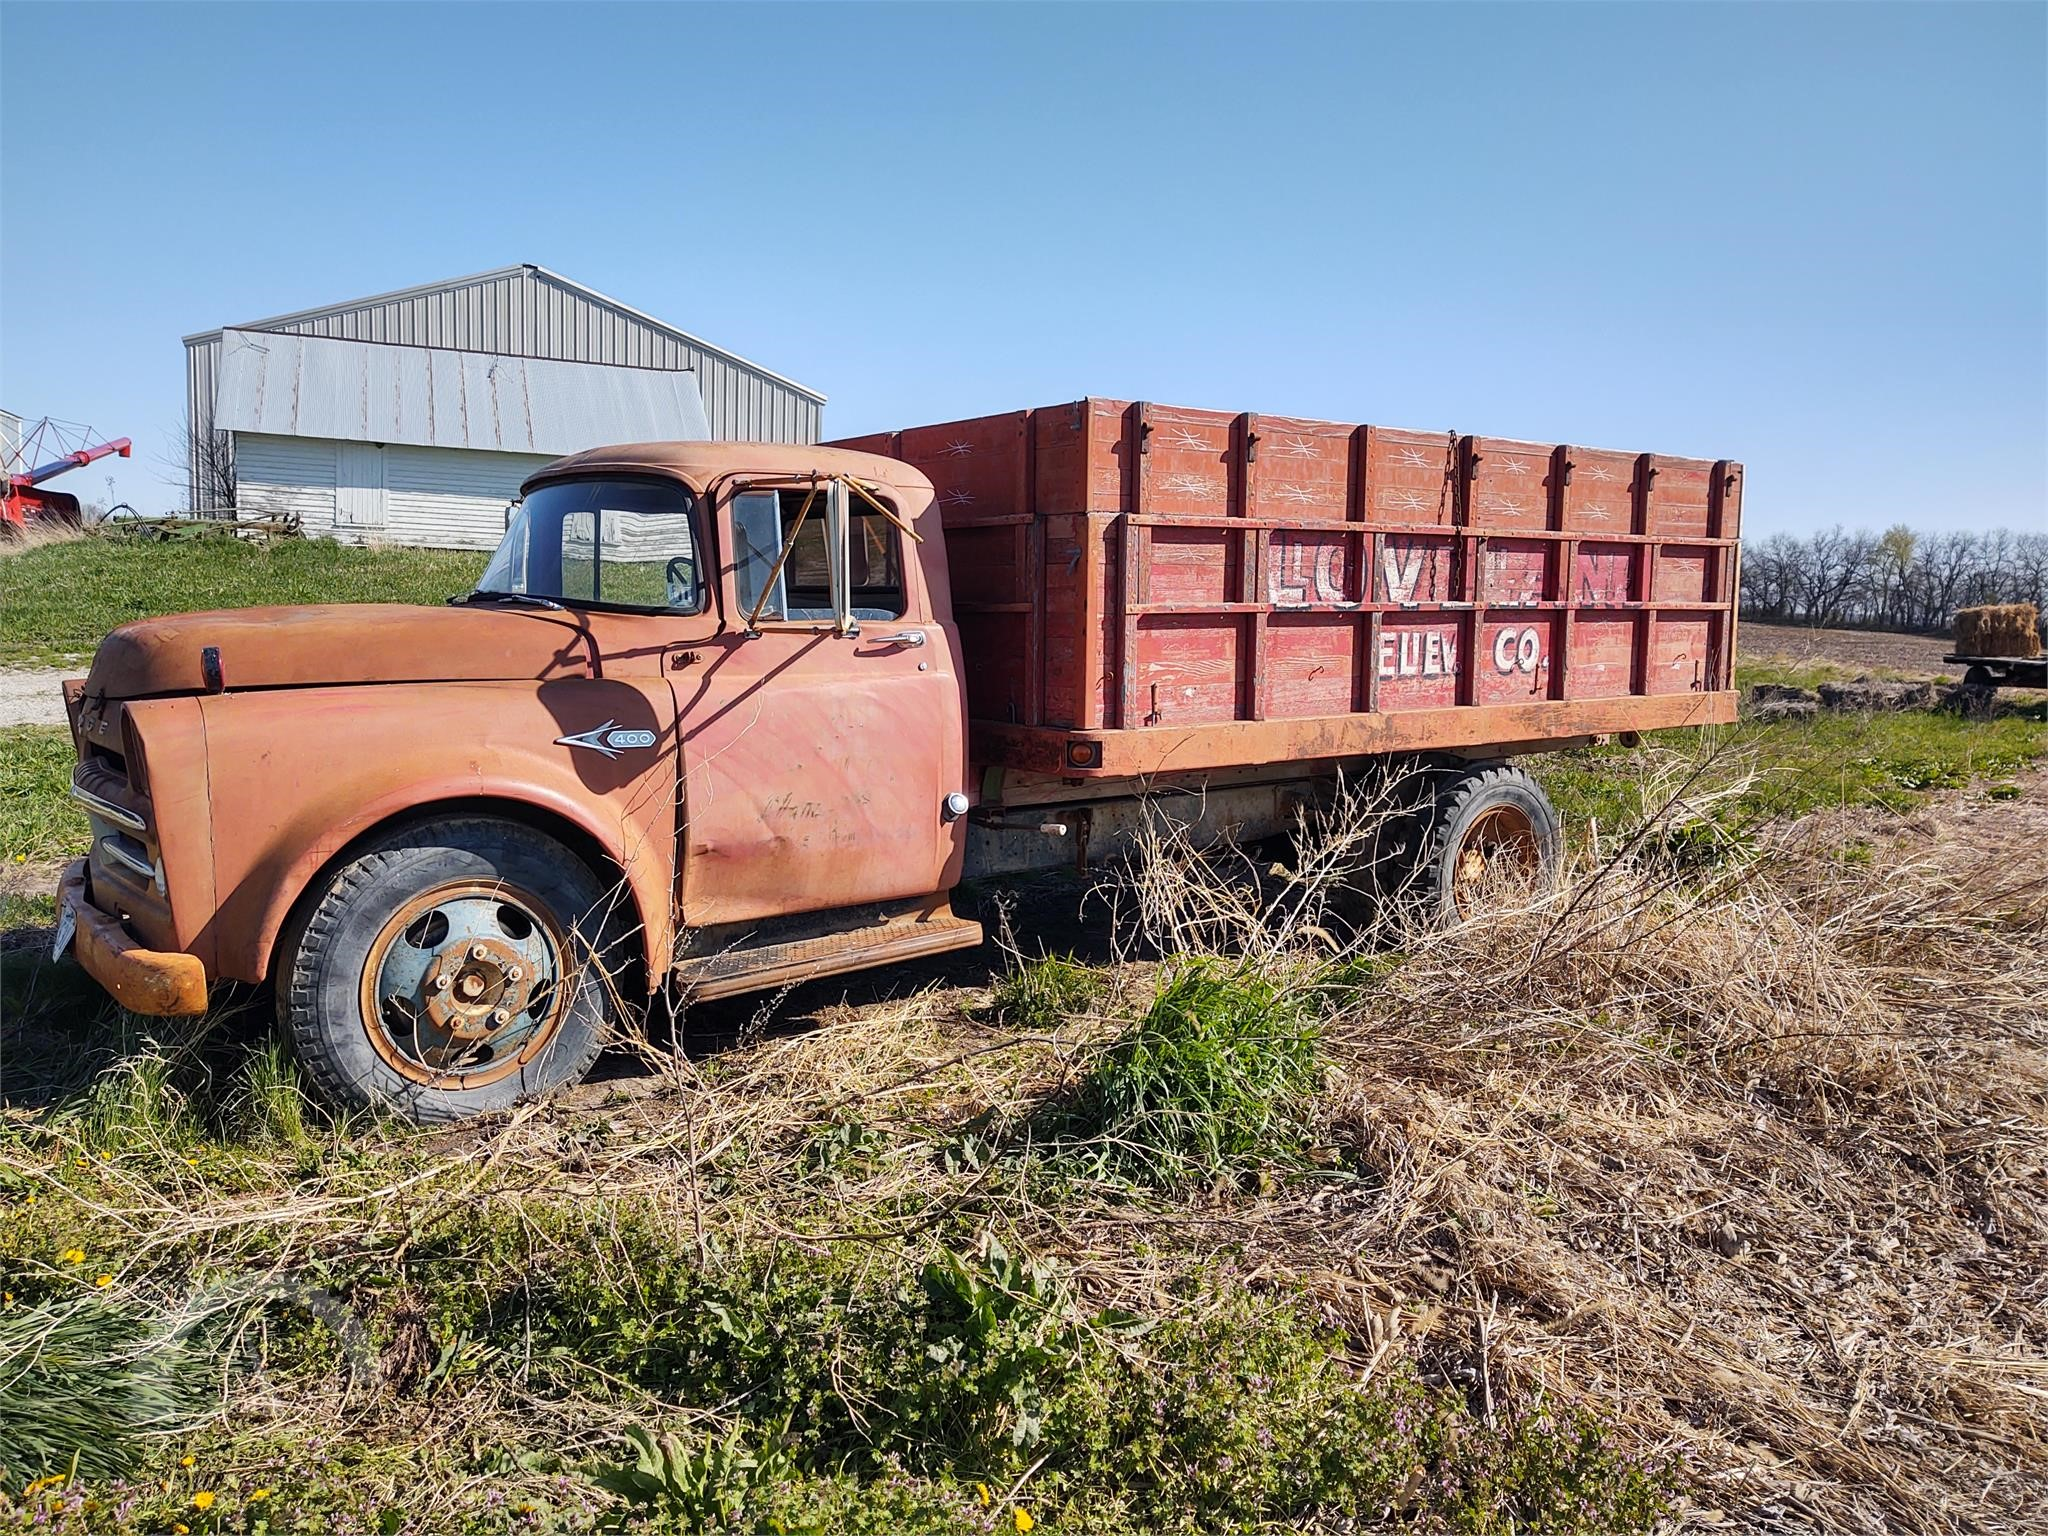 old dodge grain trucks for sale DODGE Farm Trucks / Grain Trucks Auction Results - 2 Listings